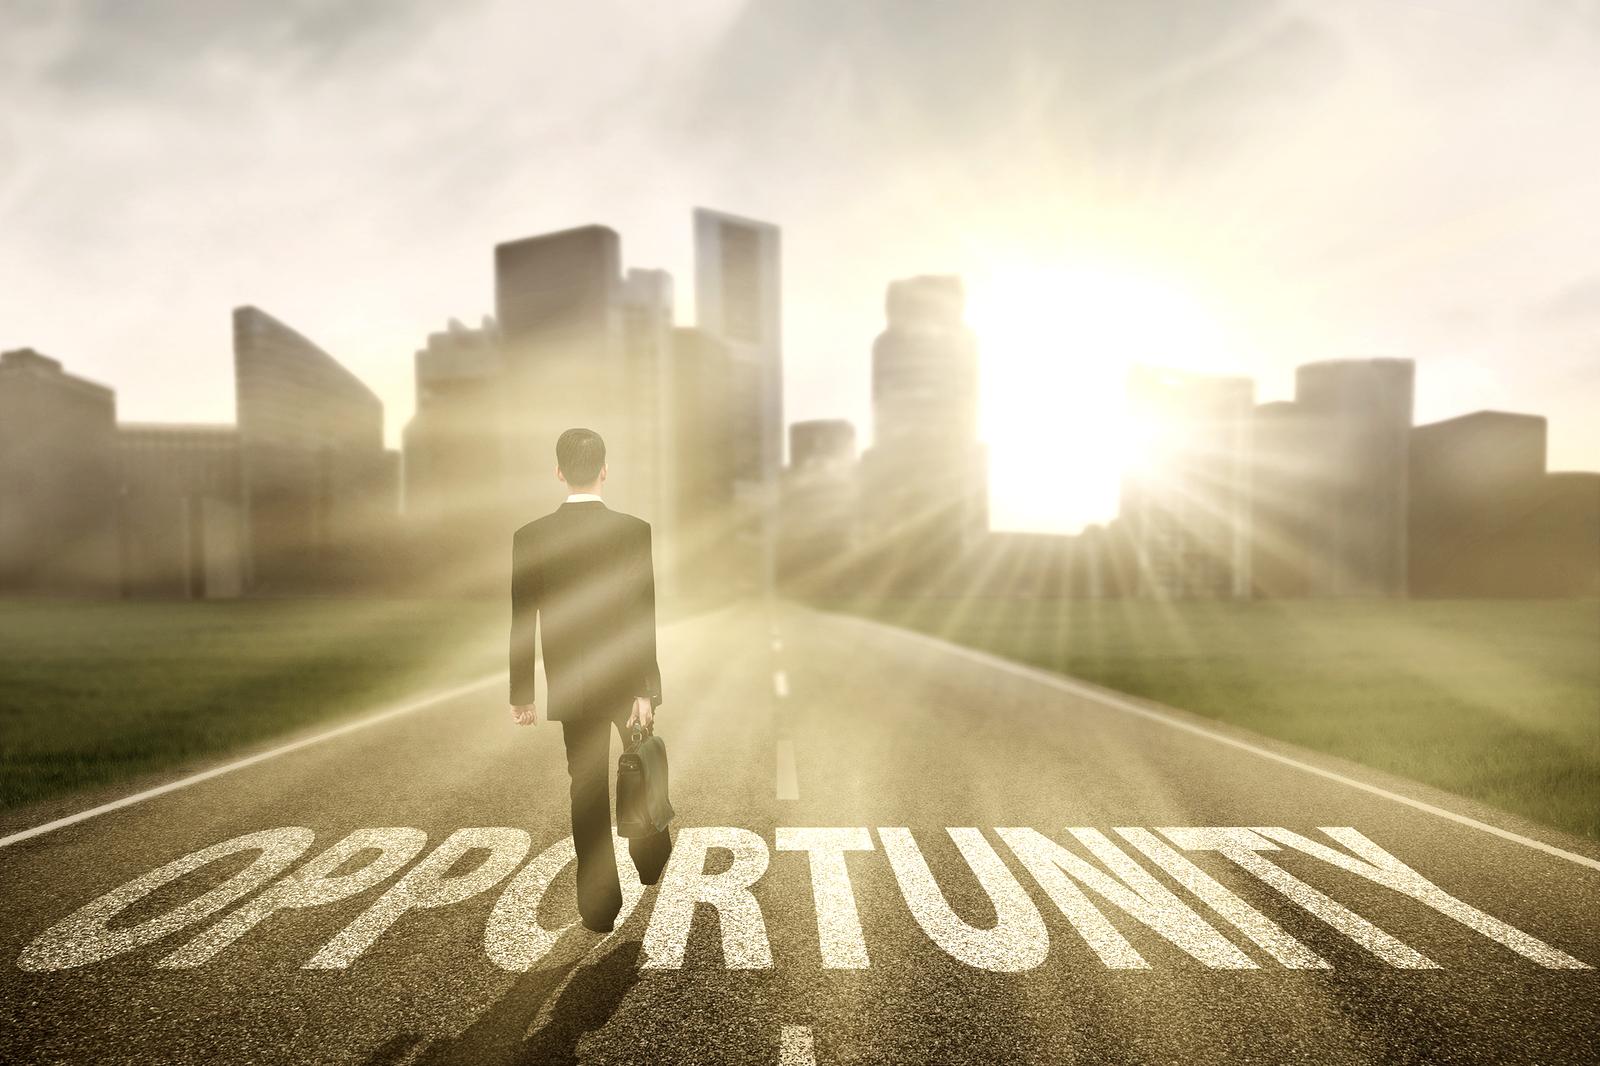 Exploring Business Opportunities